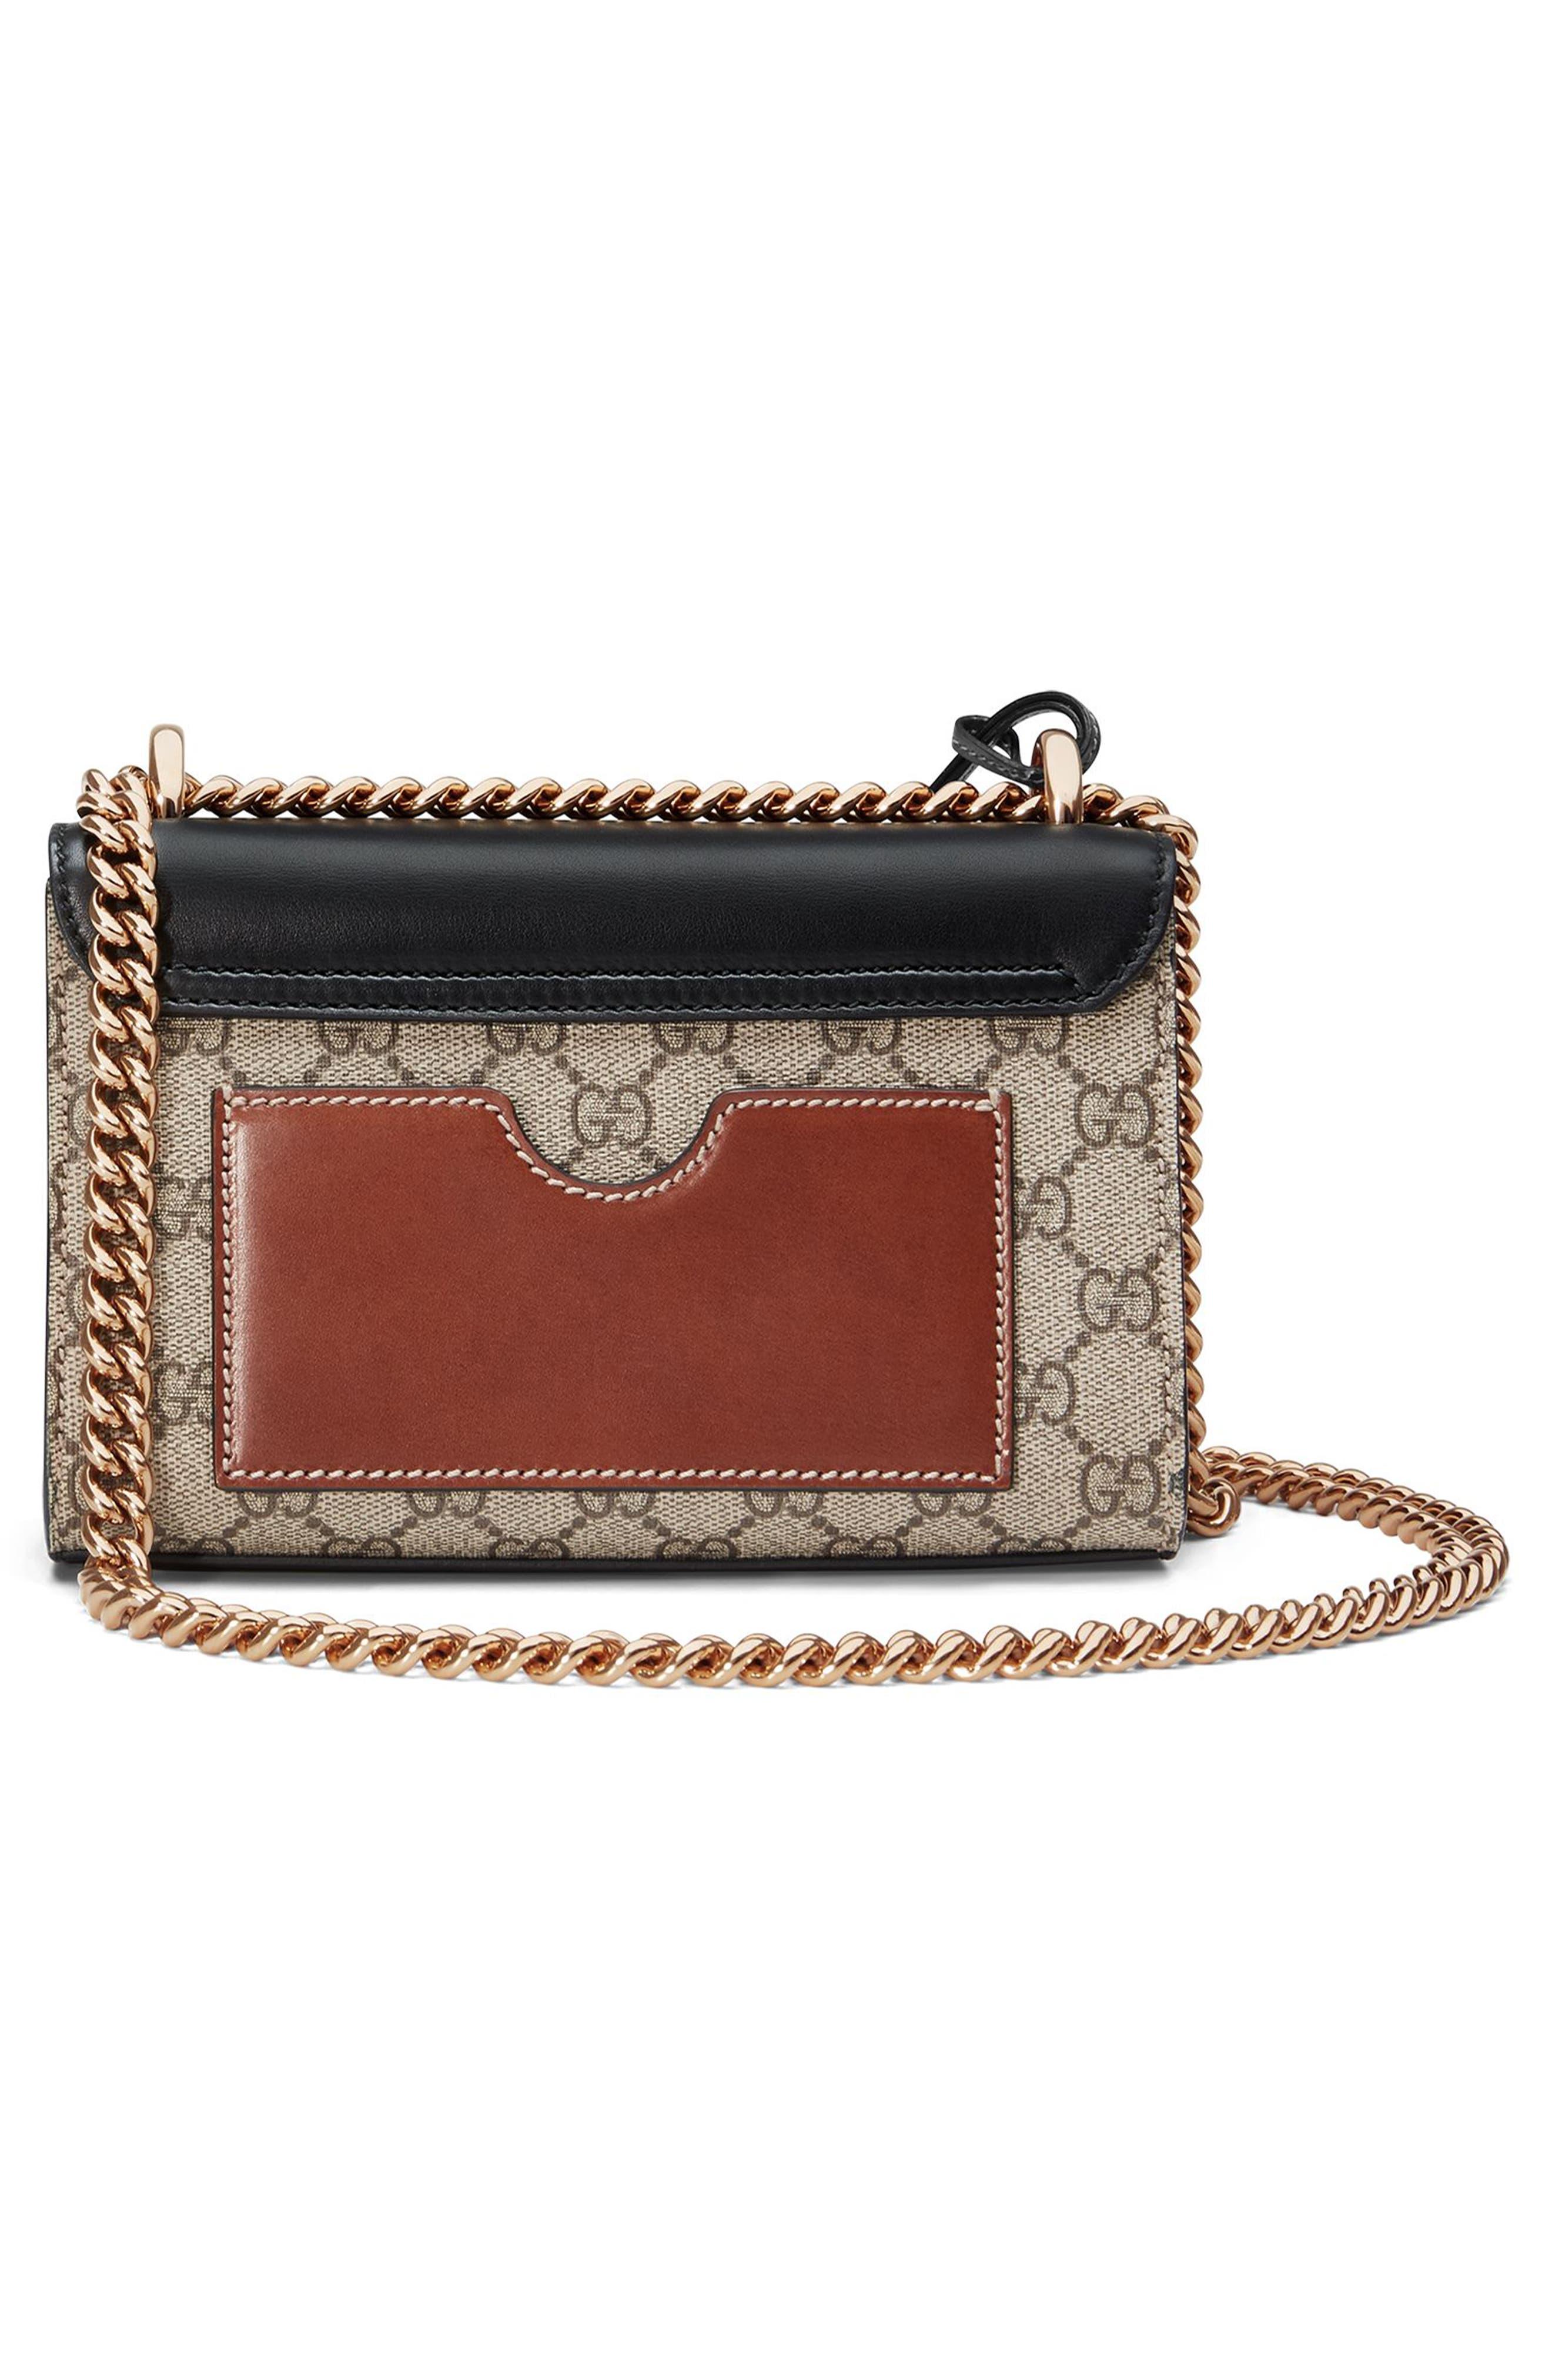 GUCCI, Small Padlock GG Supreme Canvas & Leather Shoulder Bag, Alternate thumbnail 2, color, MOON/TOSCANO